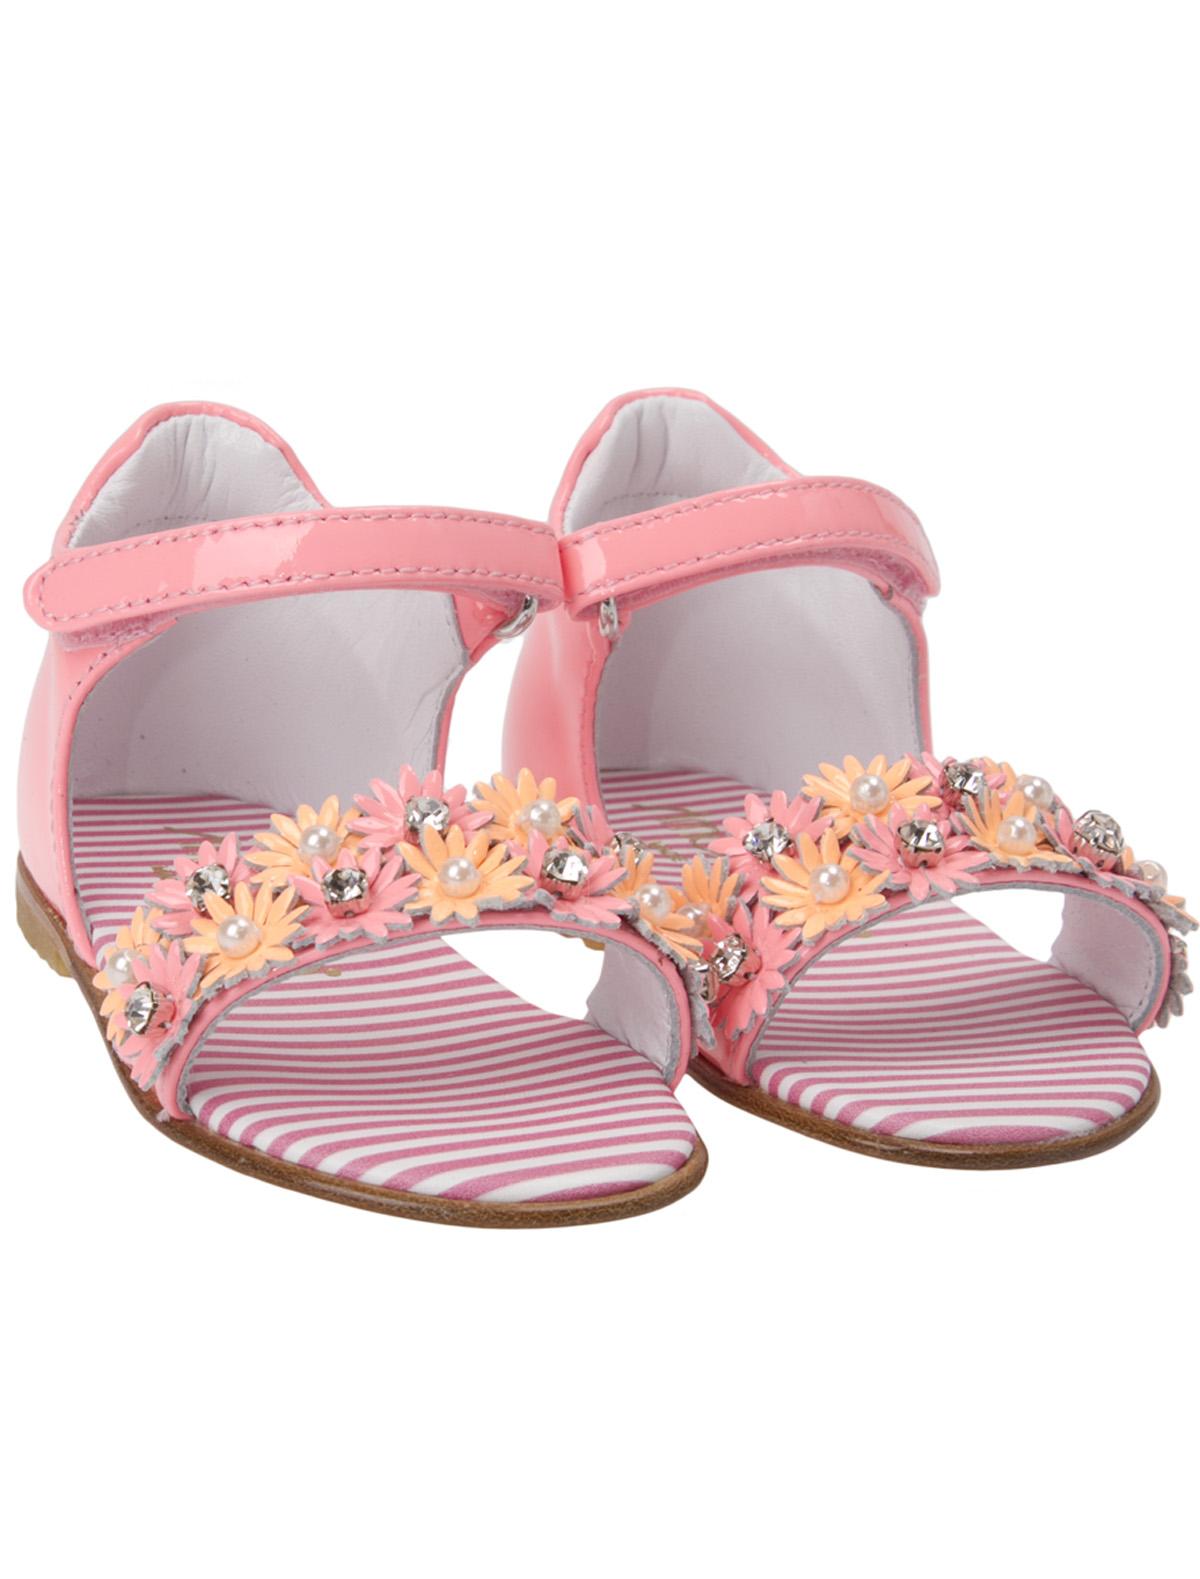 Босоножки Simonetta розового цвета